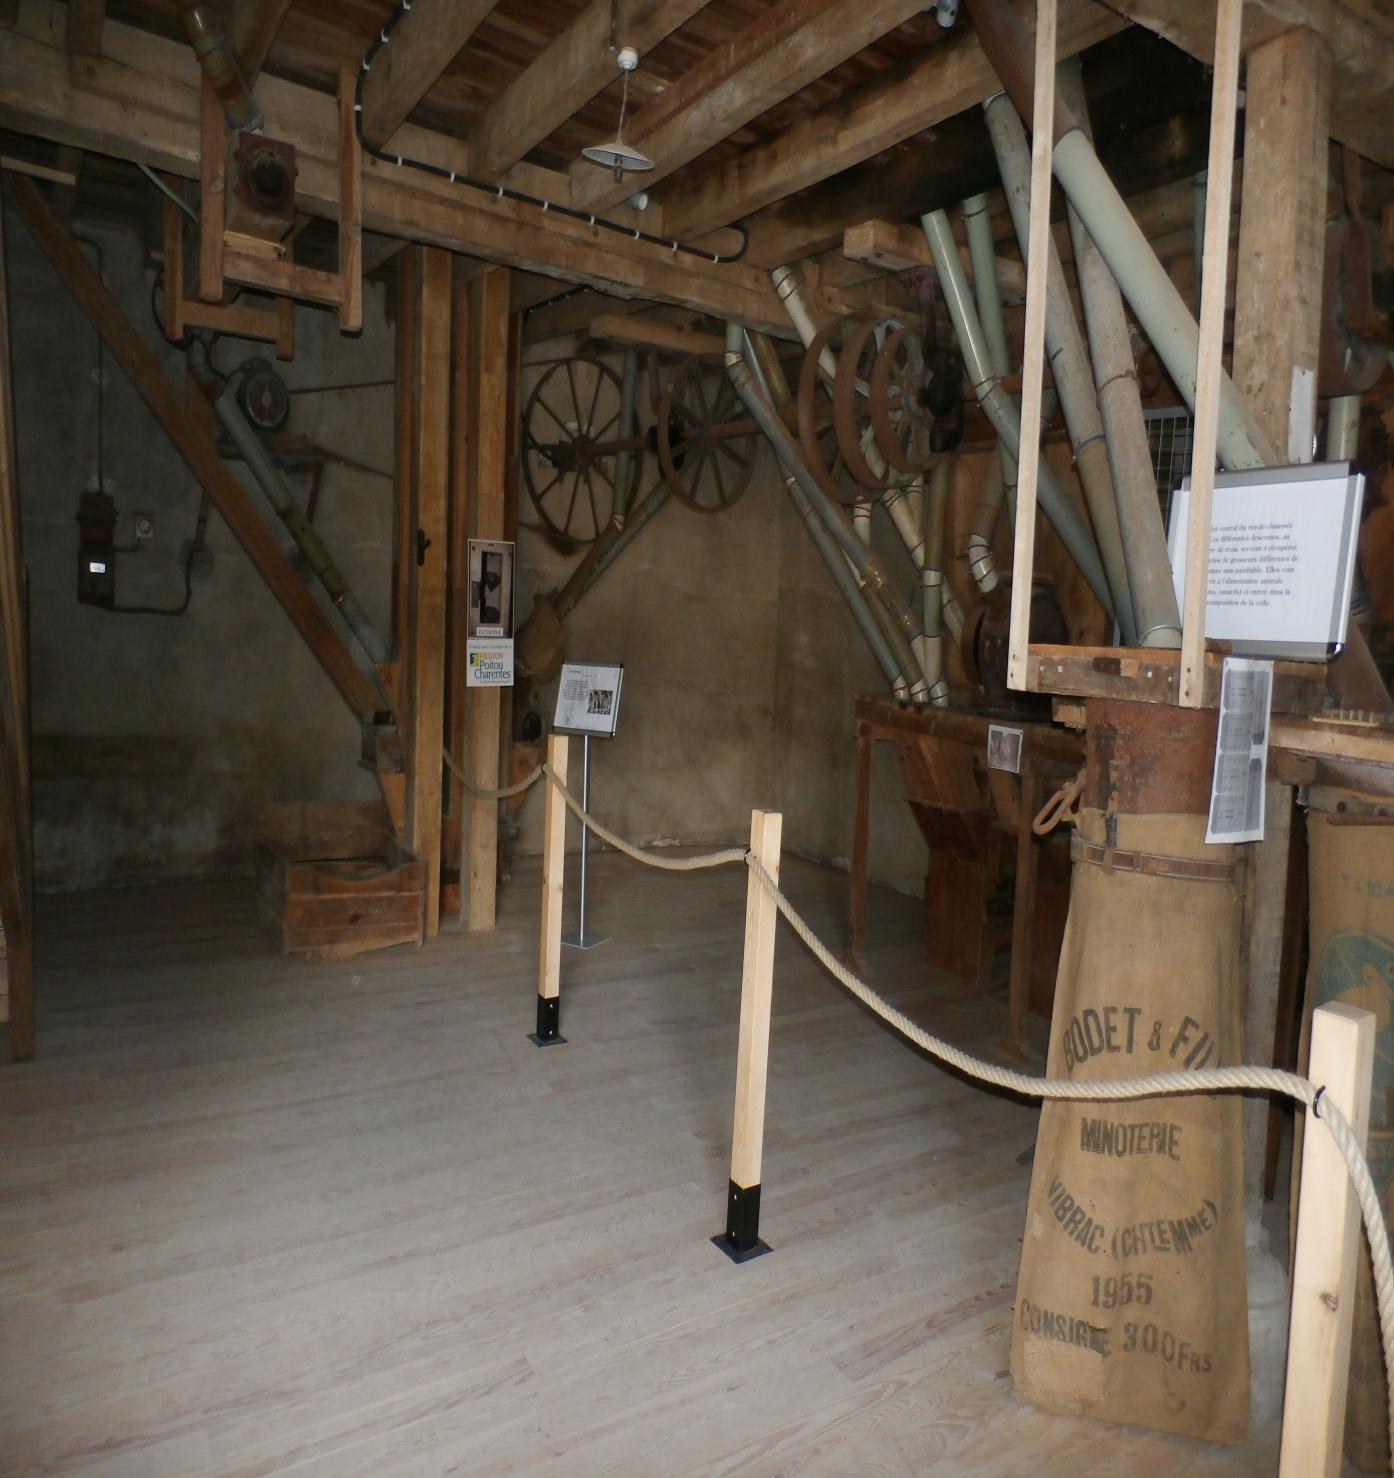 Moulin de poltrot